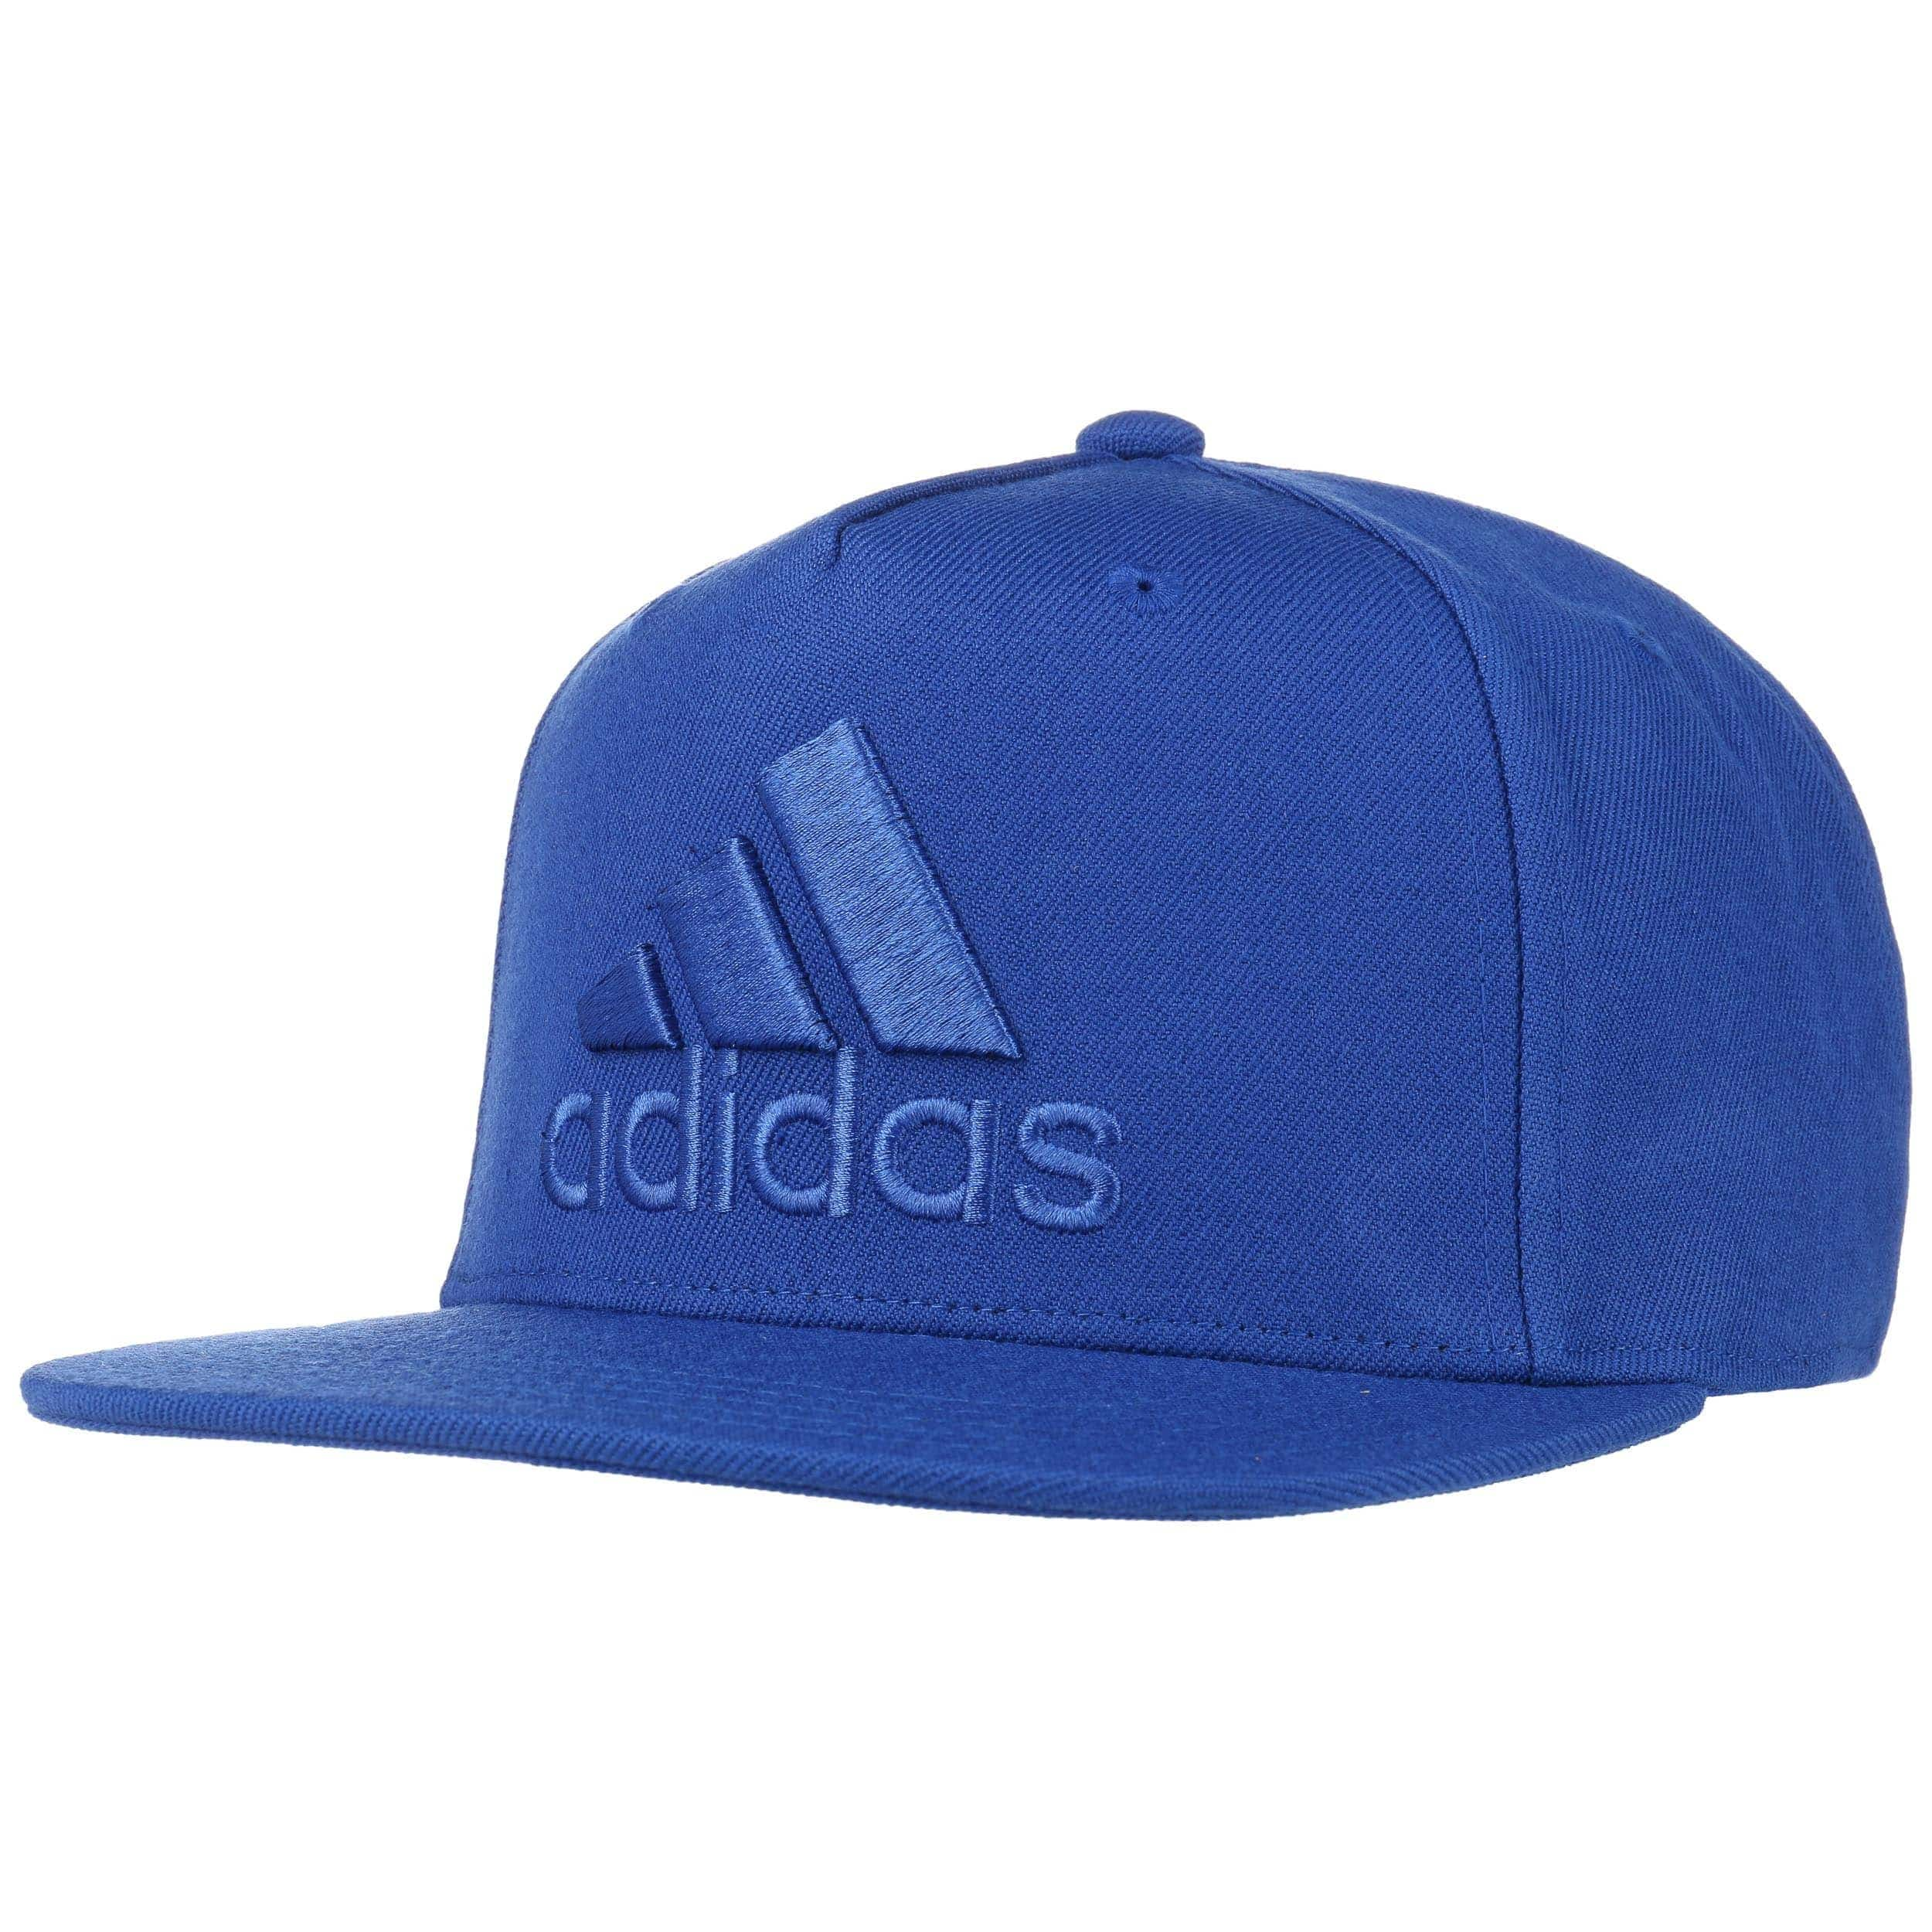 fashion styles d960d 40d94 adidas logo snapback cap - anuarios ... 1e9315a7b31c